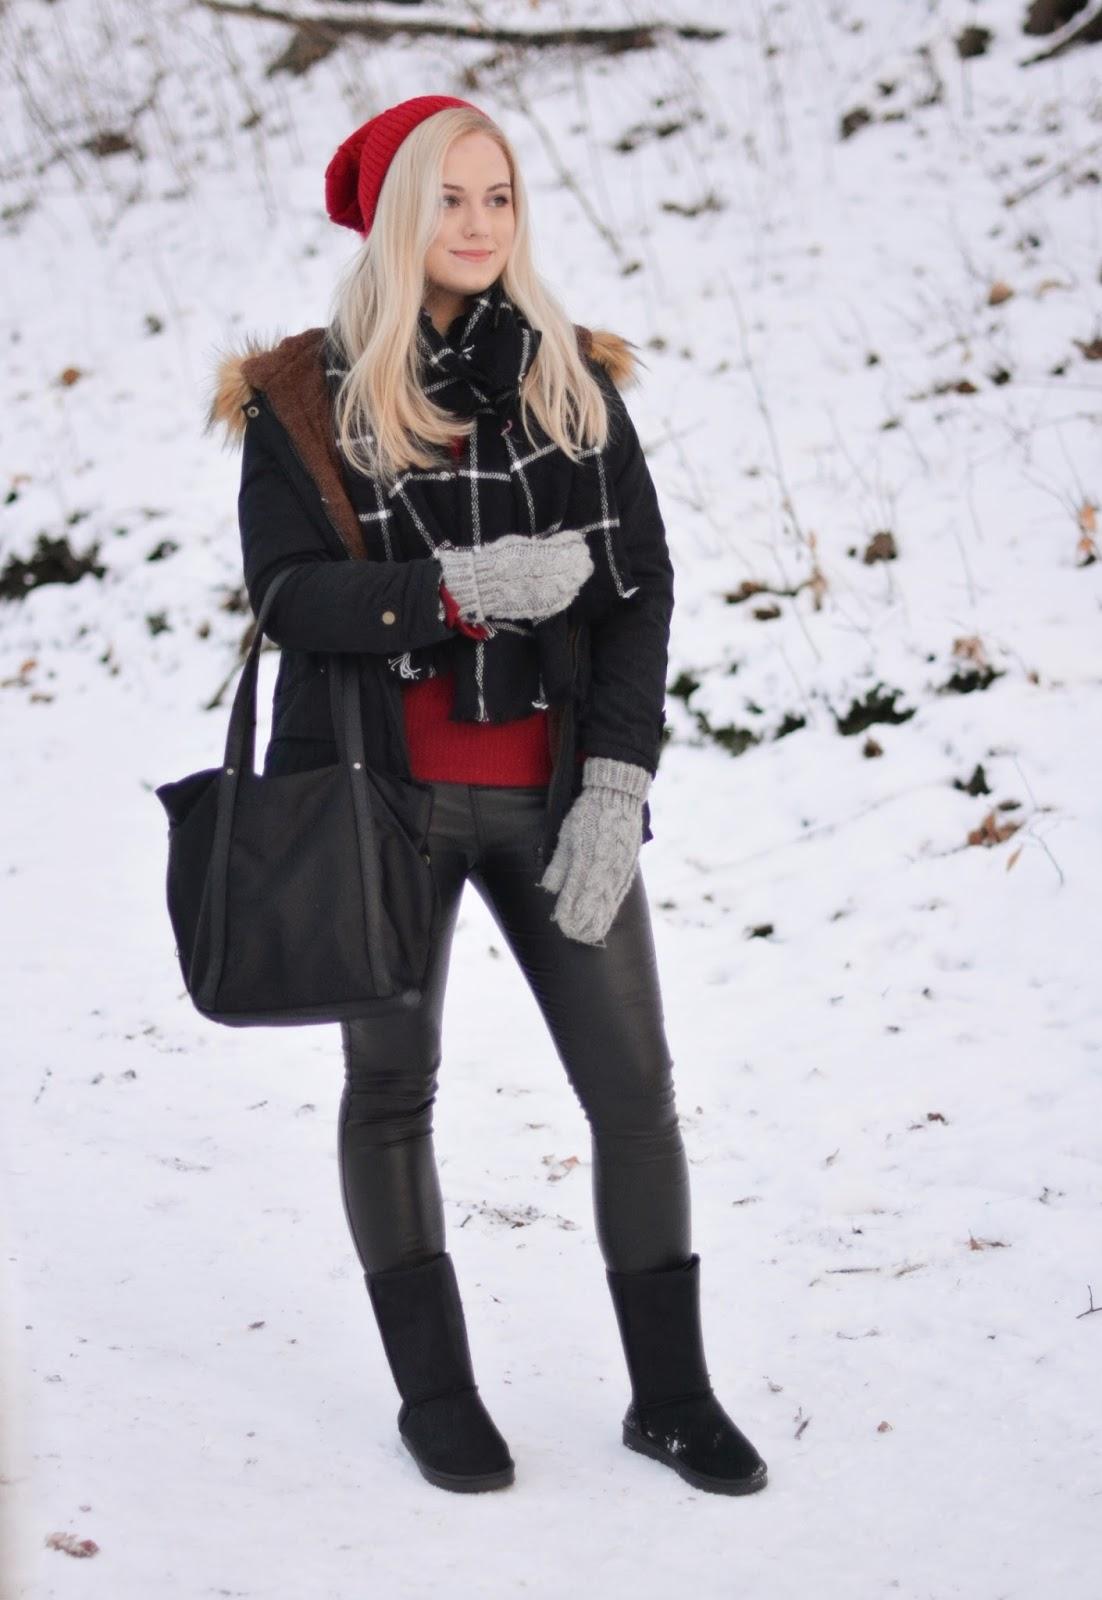 ciepłu ubiór zima